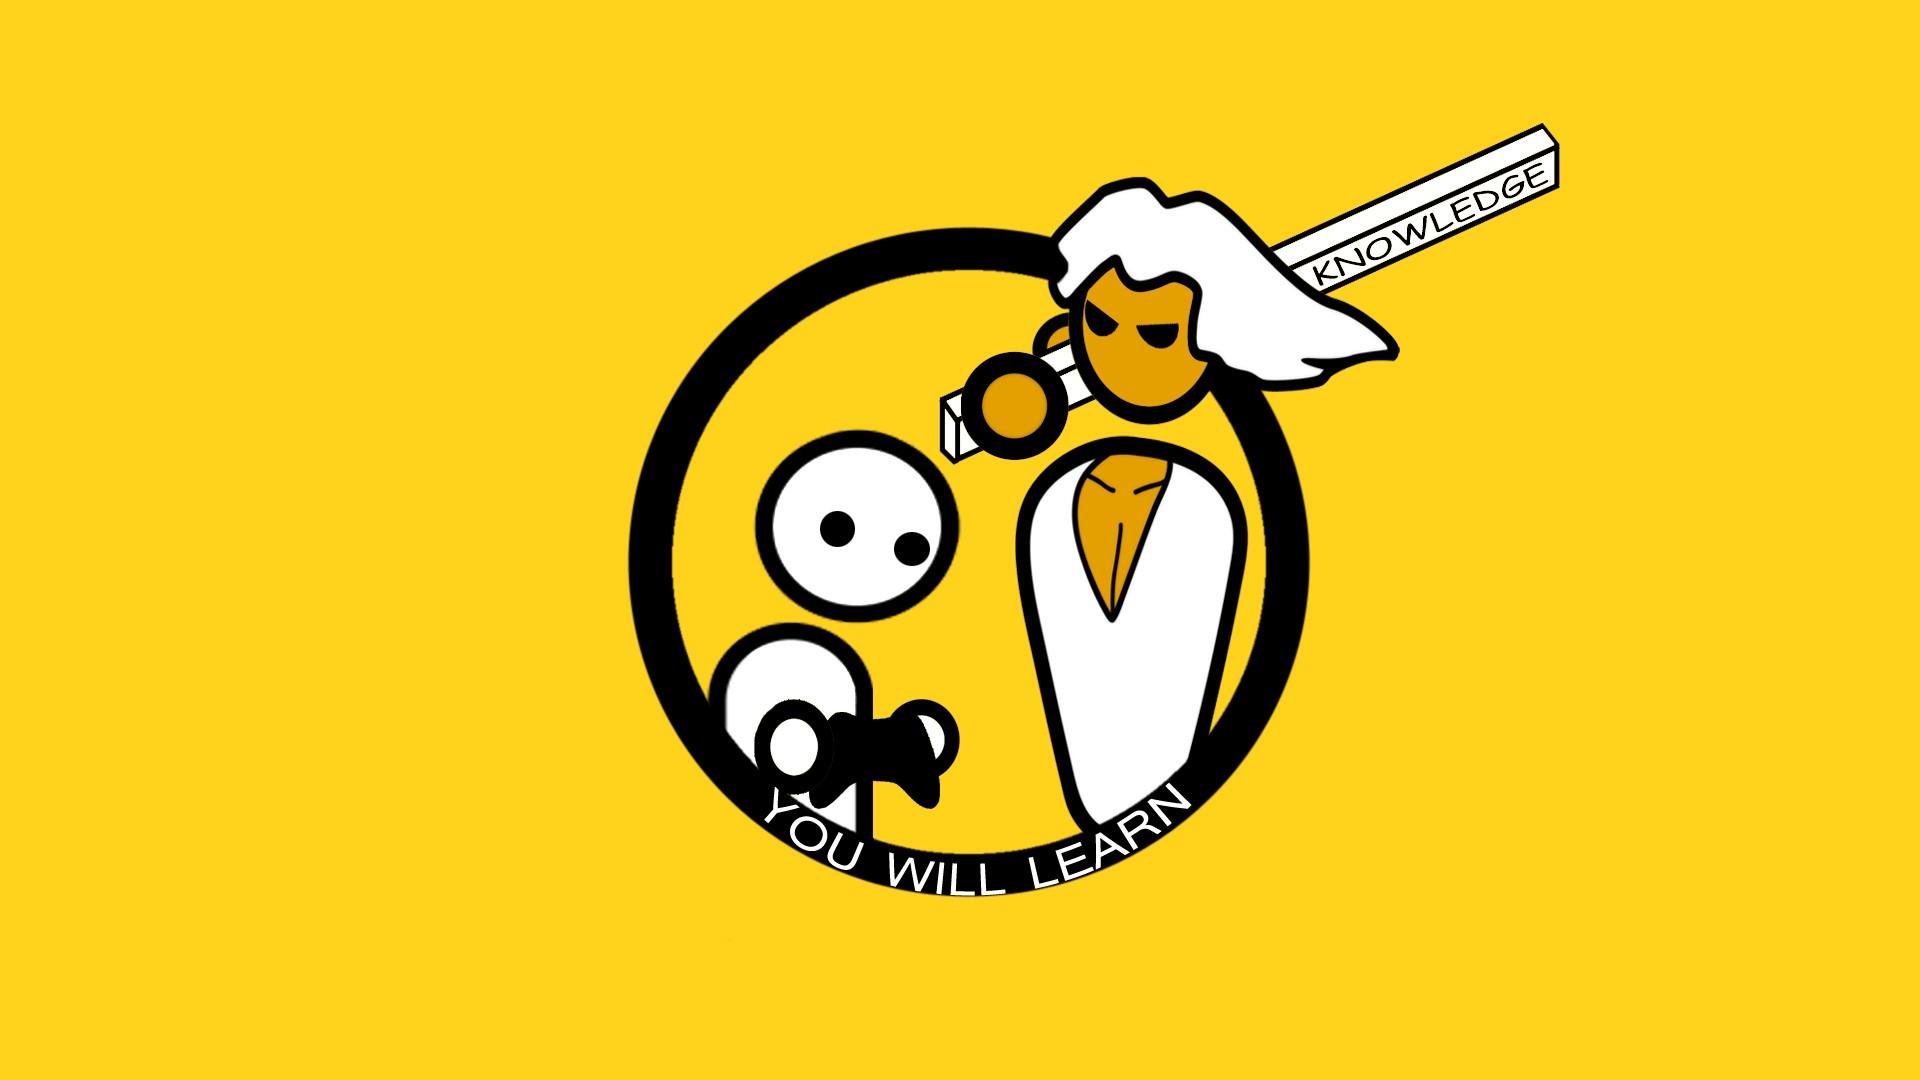 Wallpaper : illustration, logo, cartoon, PC gaming, PC.